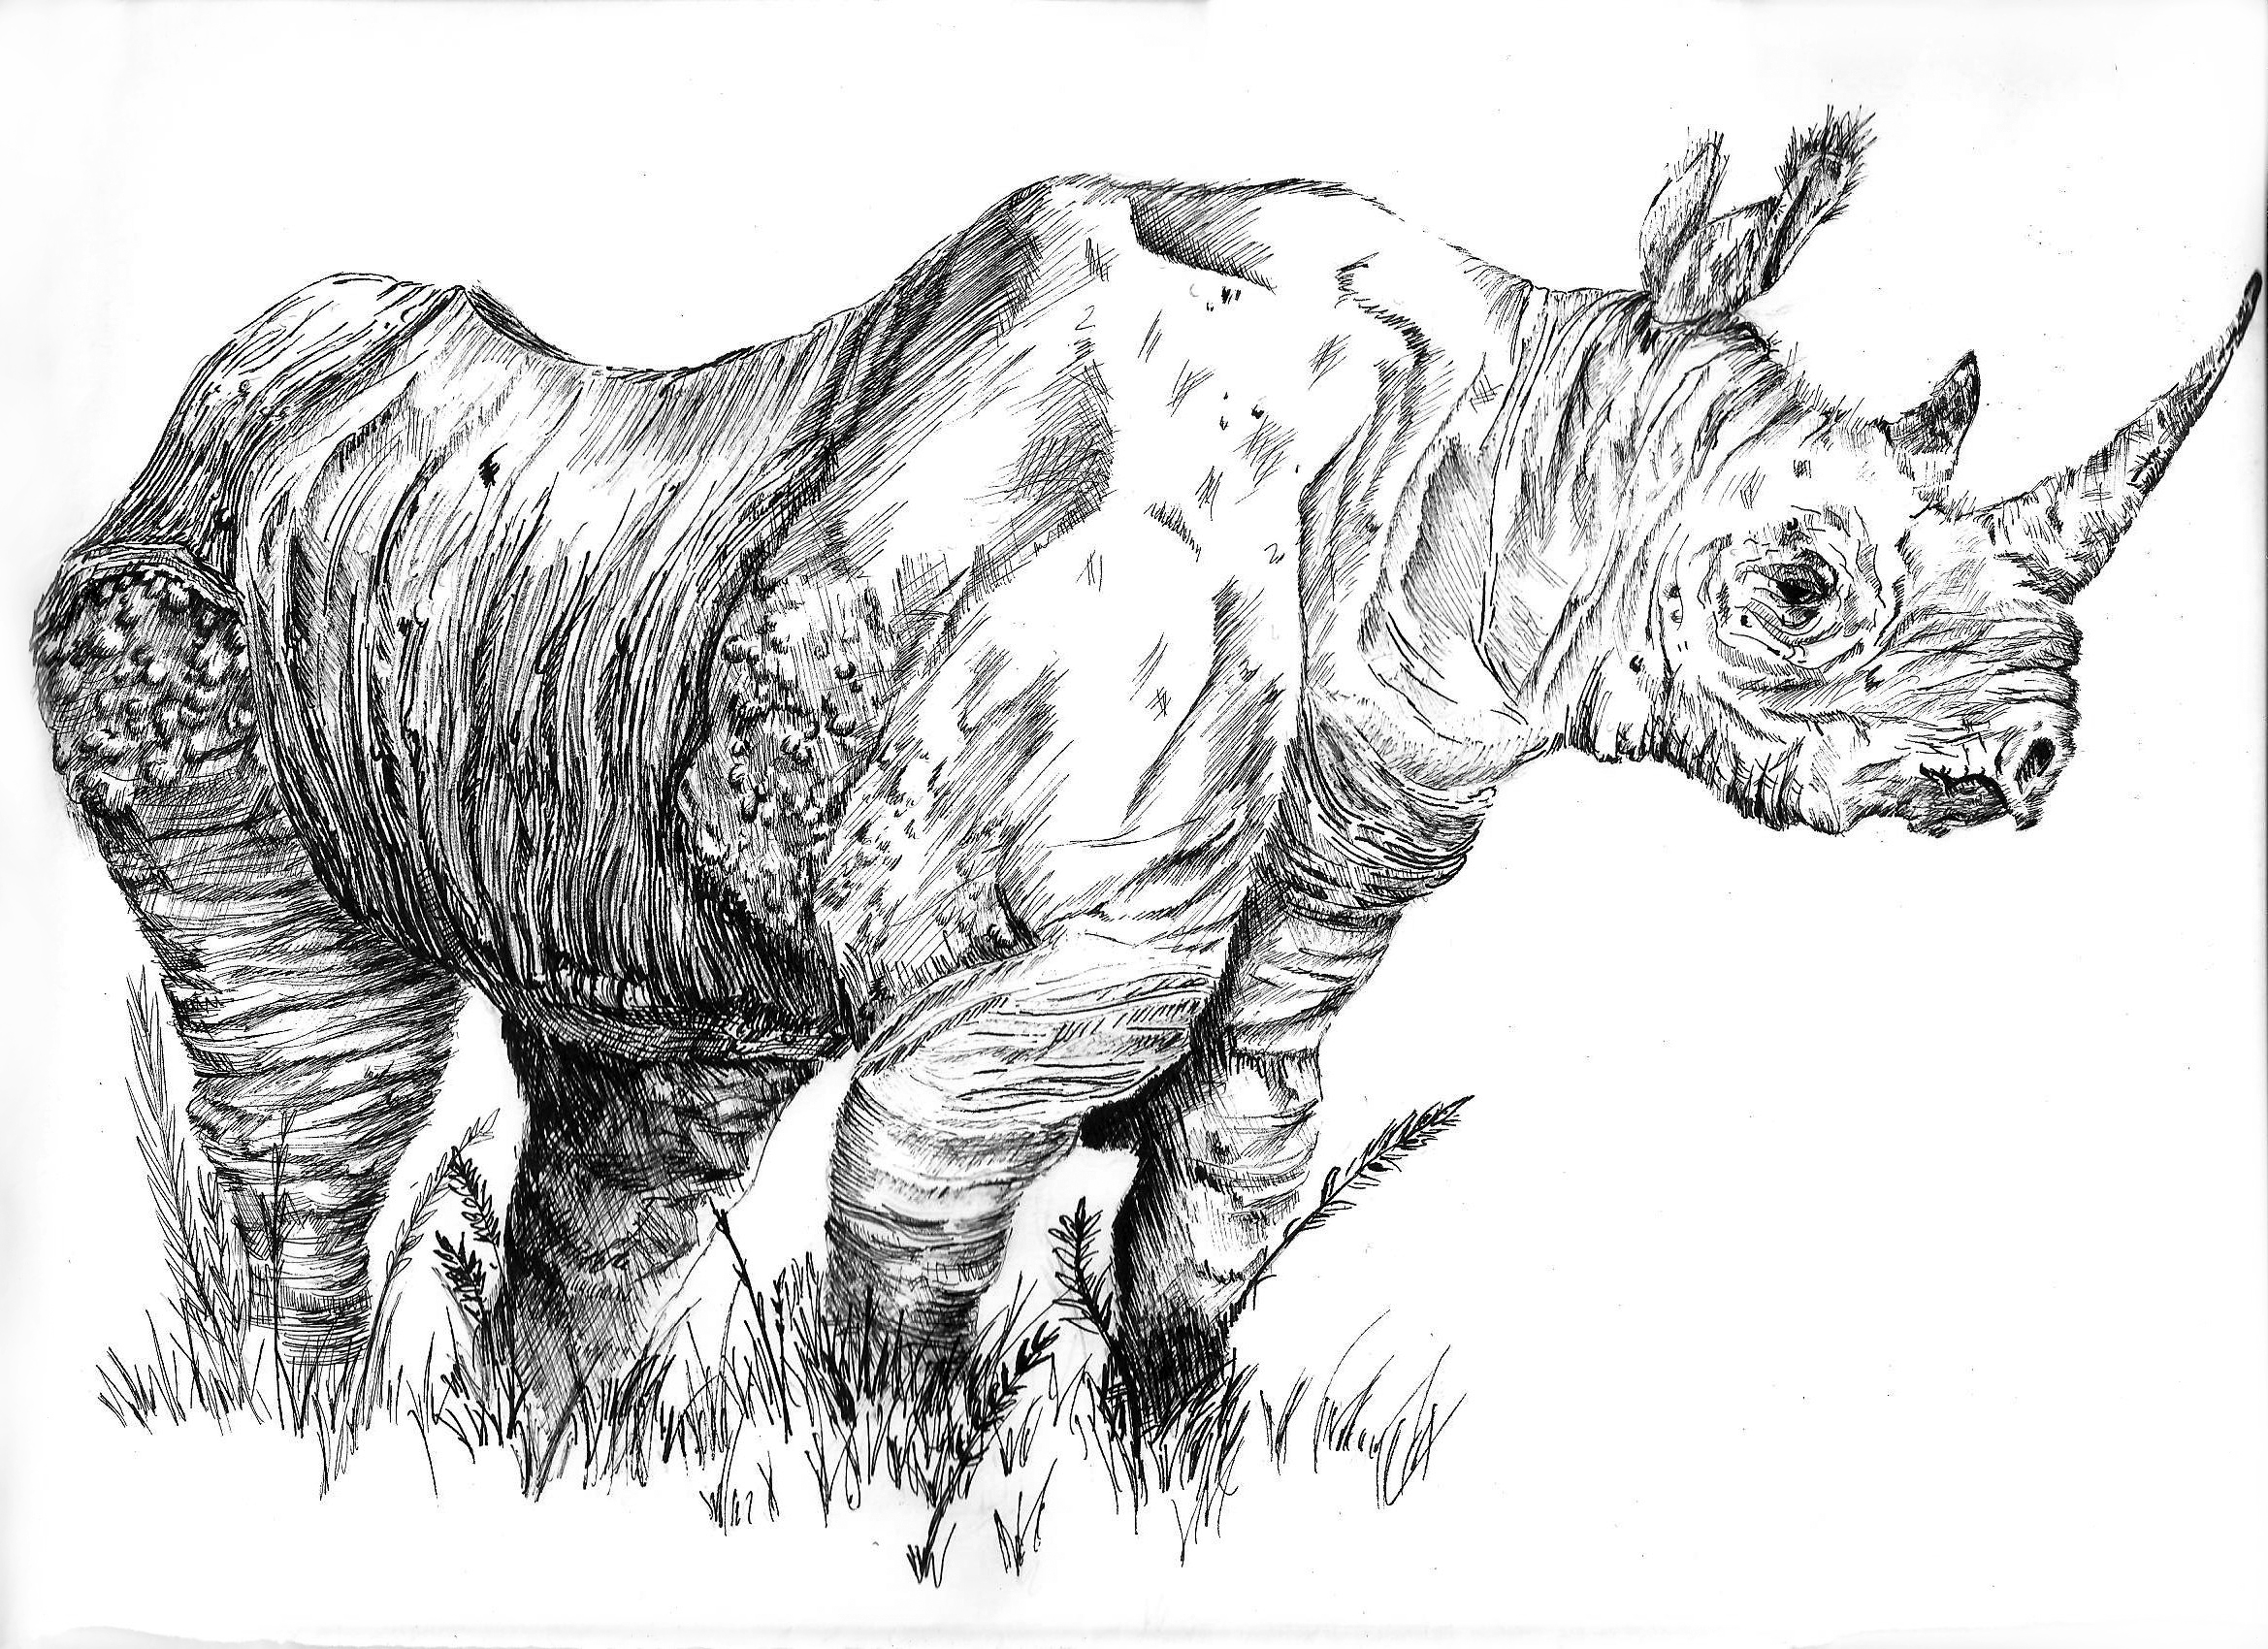 Line Drawing Rhino : West african black rhino by joegroove on deviantart